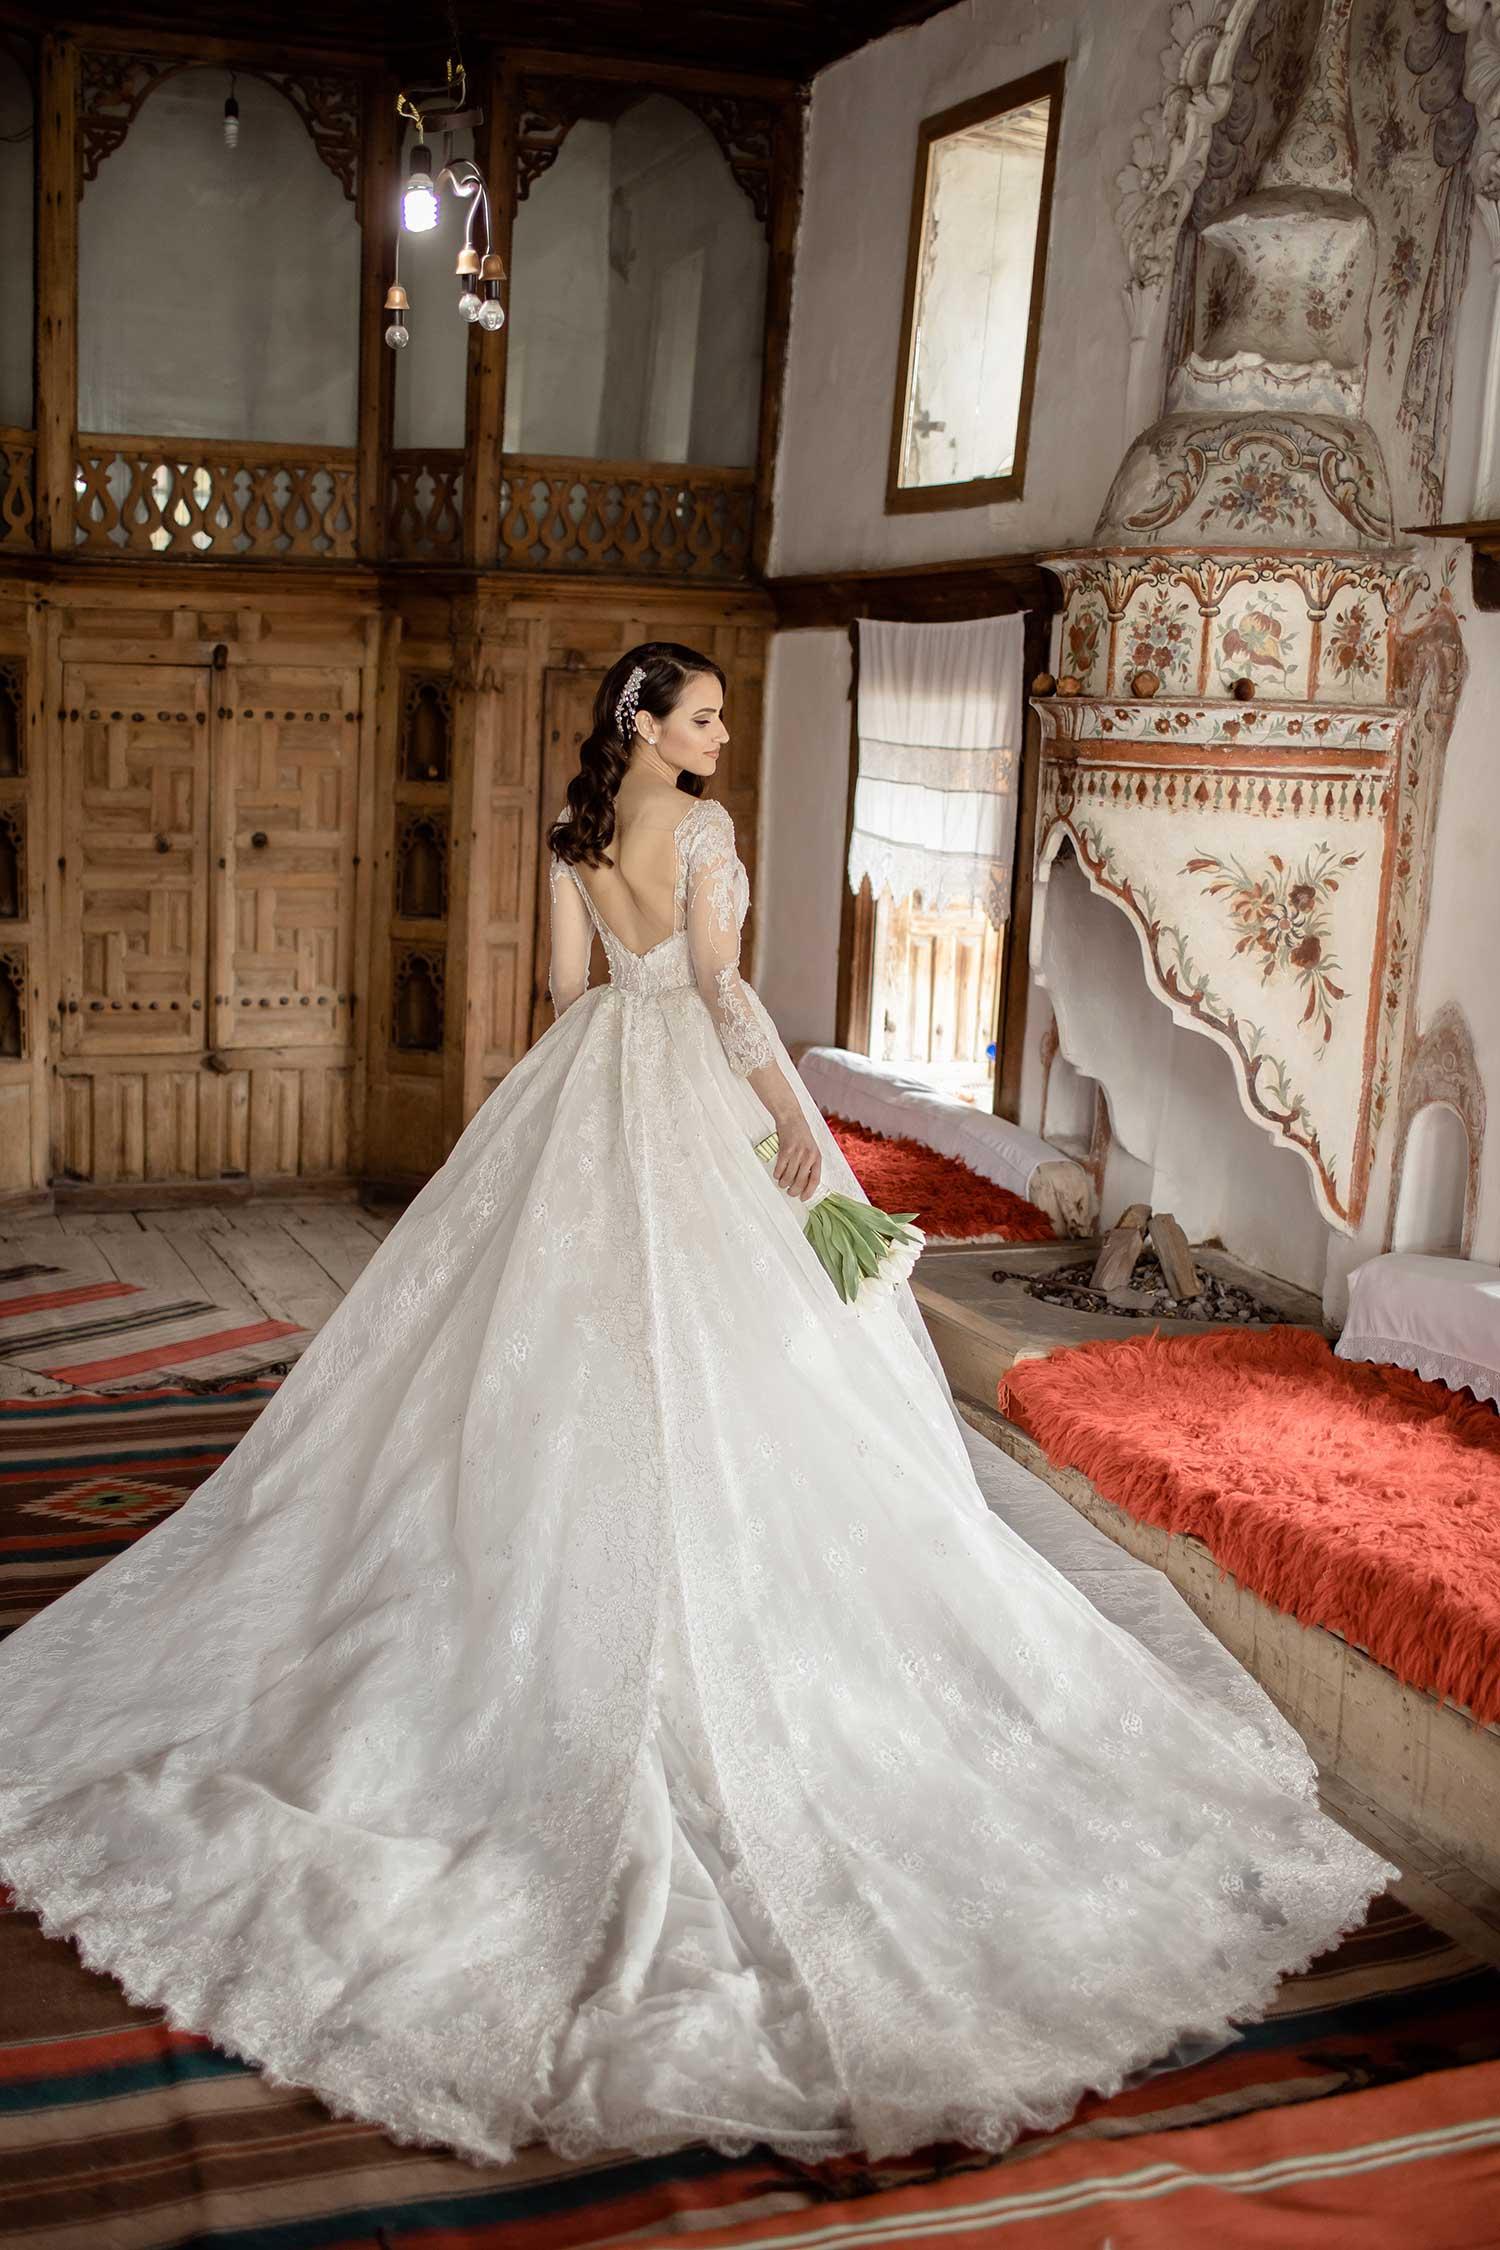 Bride's wedding photos inside a house in Gjirokaster